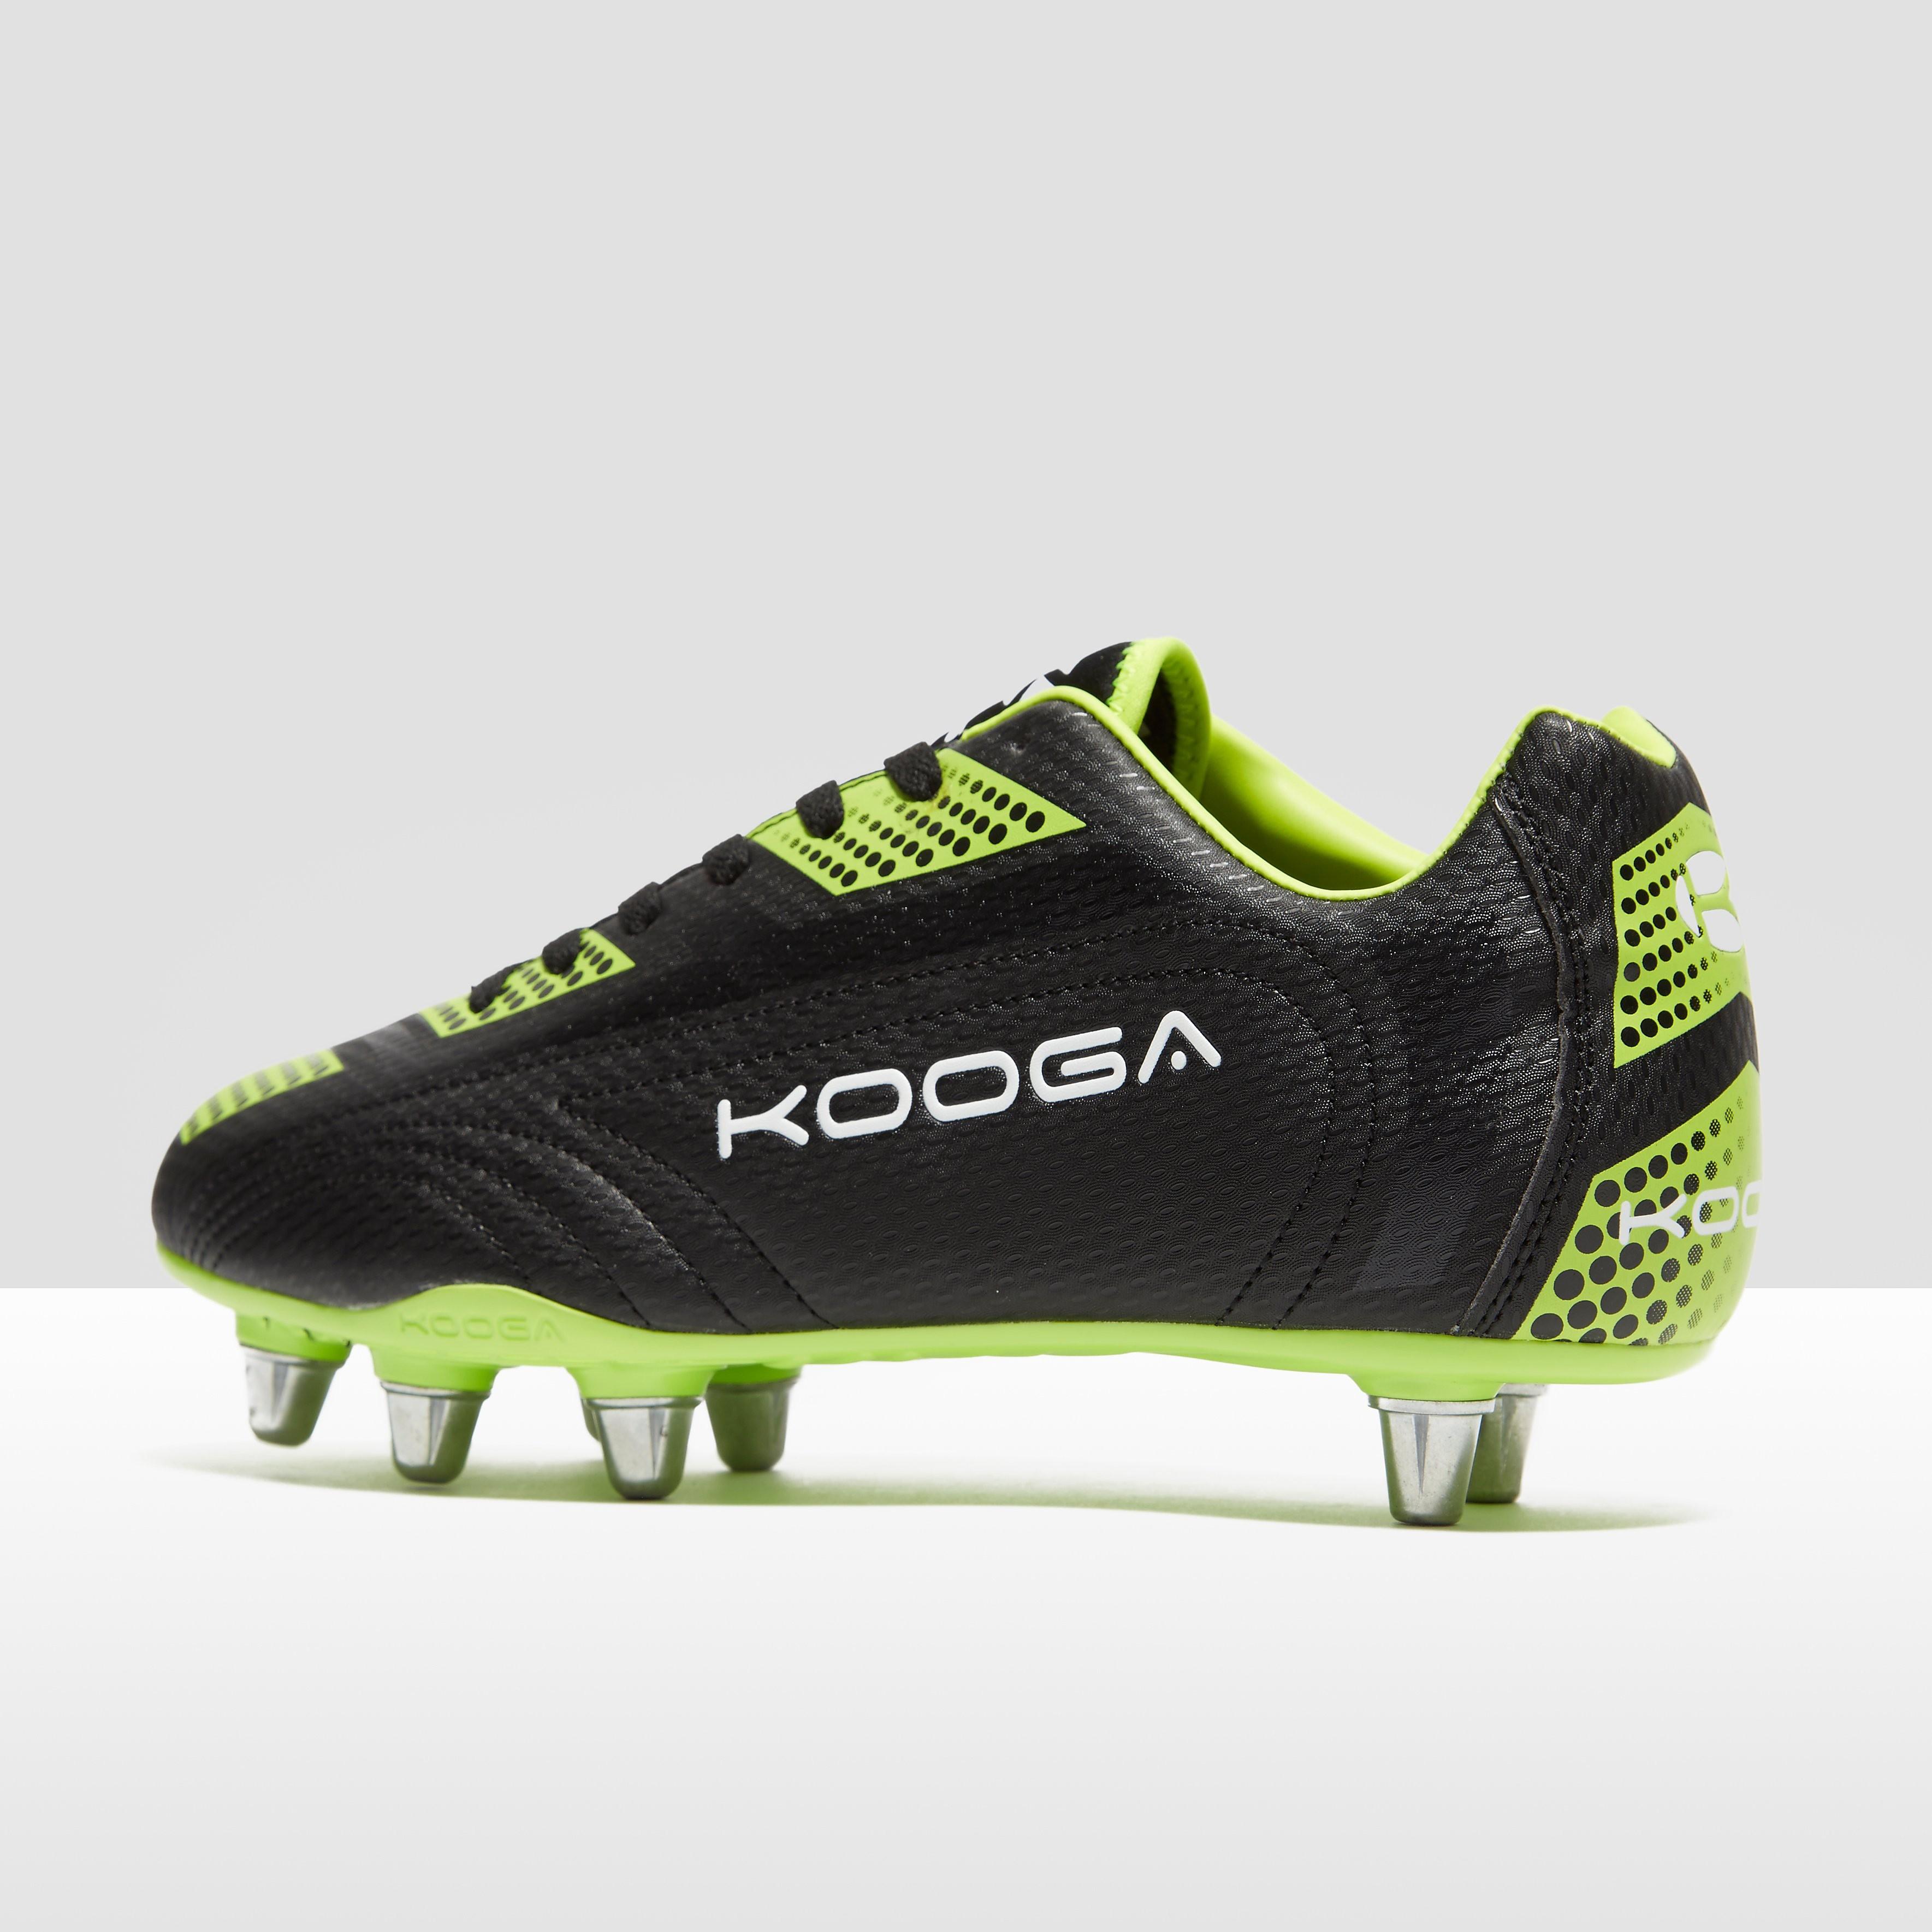 Kooga Blitz 2 SG Men's Rugby Boots